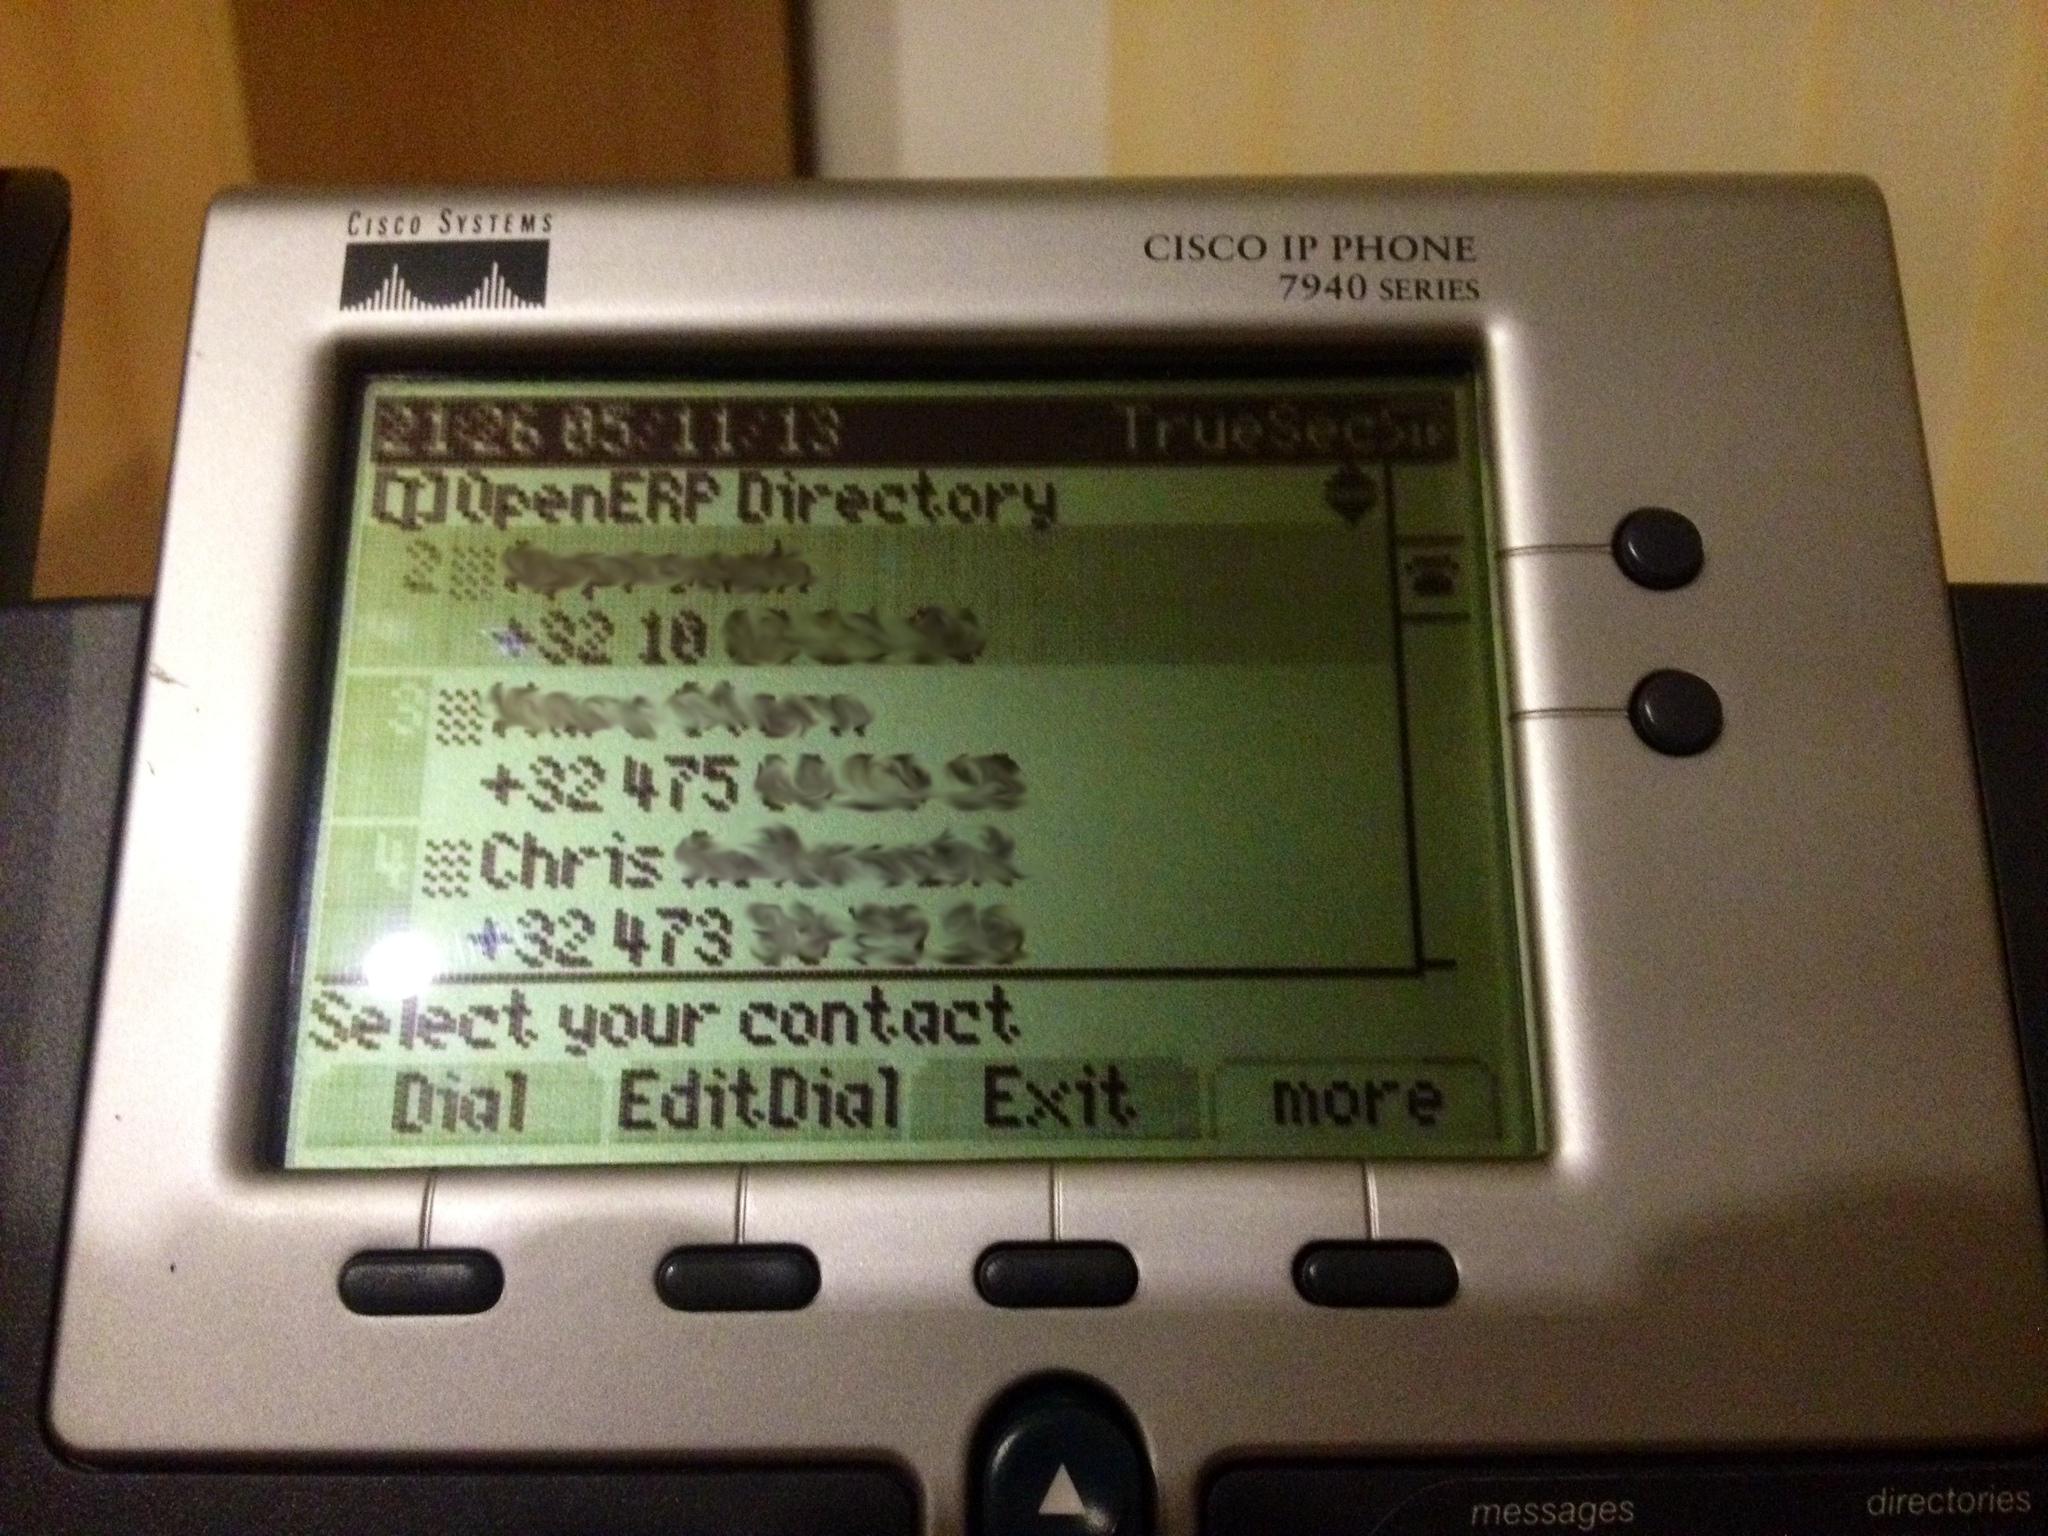 Integrating OpenERP Within a Cisco IP Phone | /dev/random